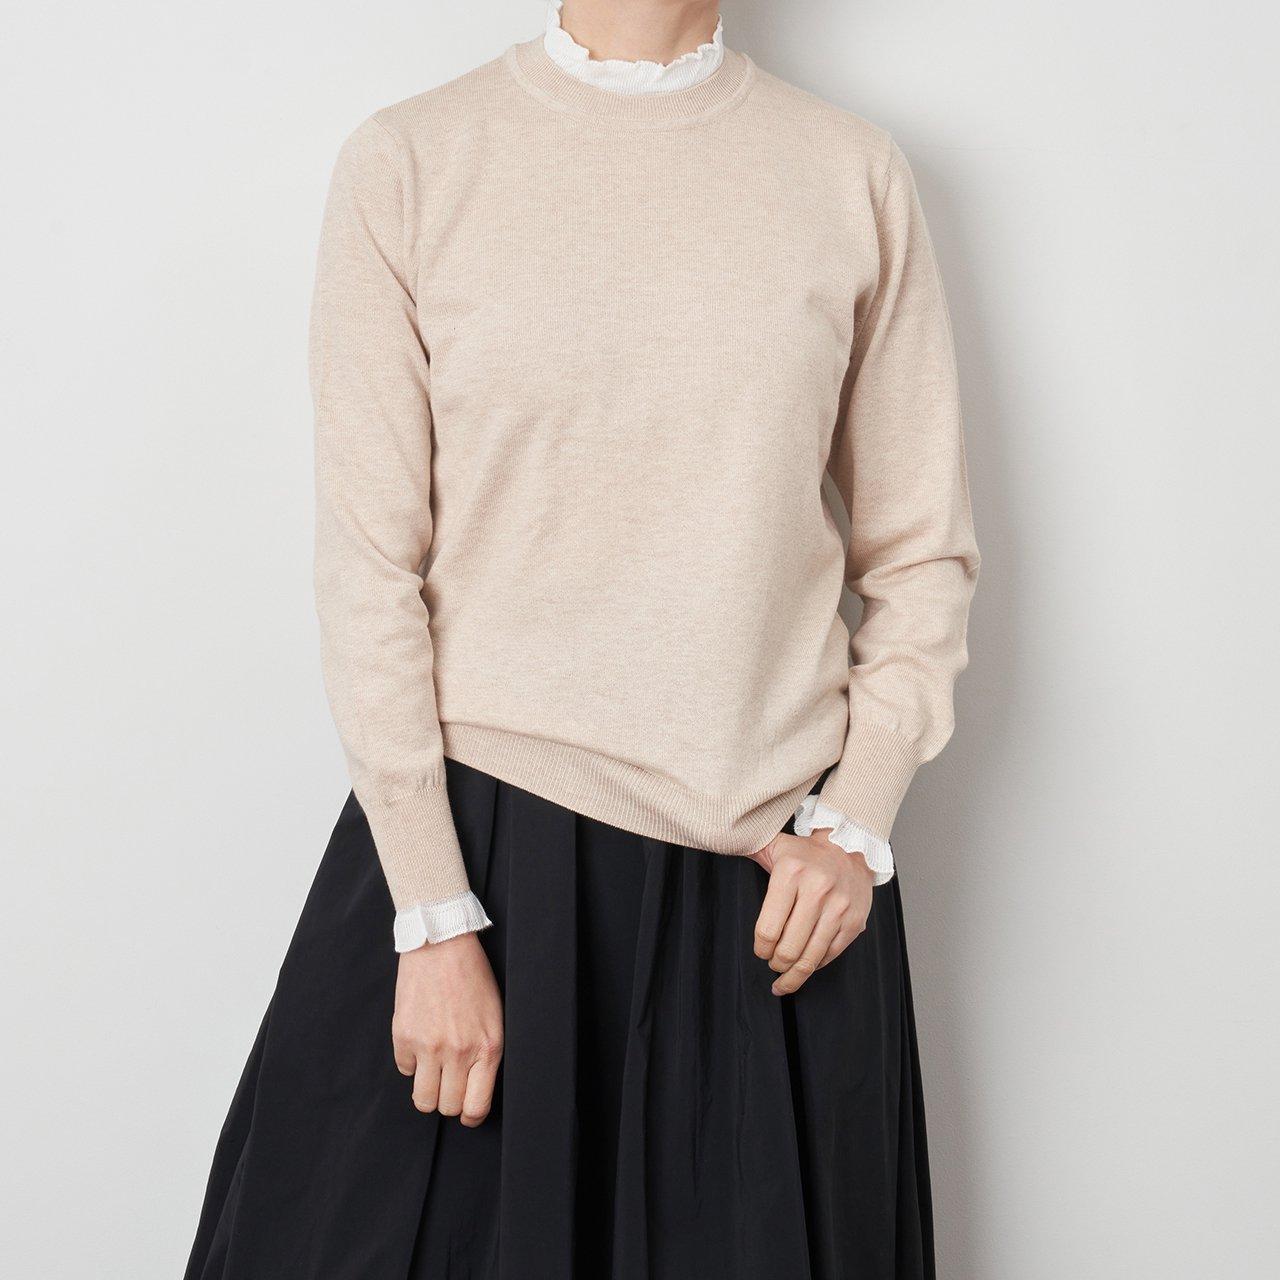 Pale Jute <BR>White frill knit P/O<BR>Beige